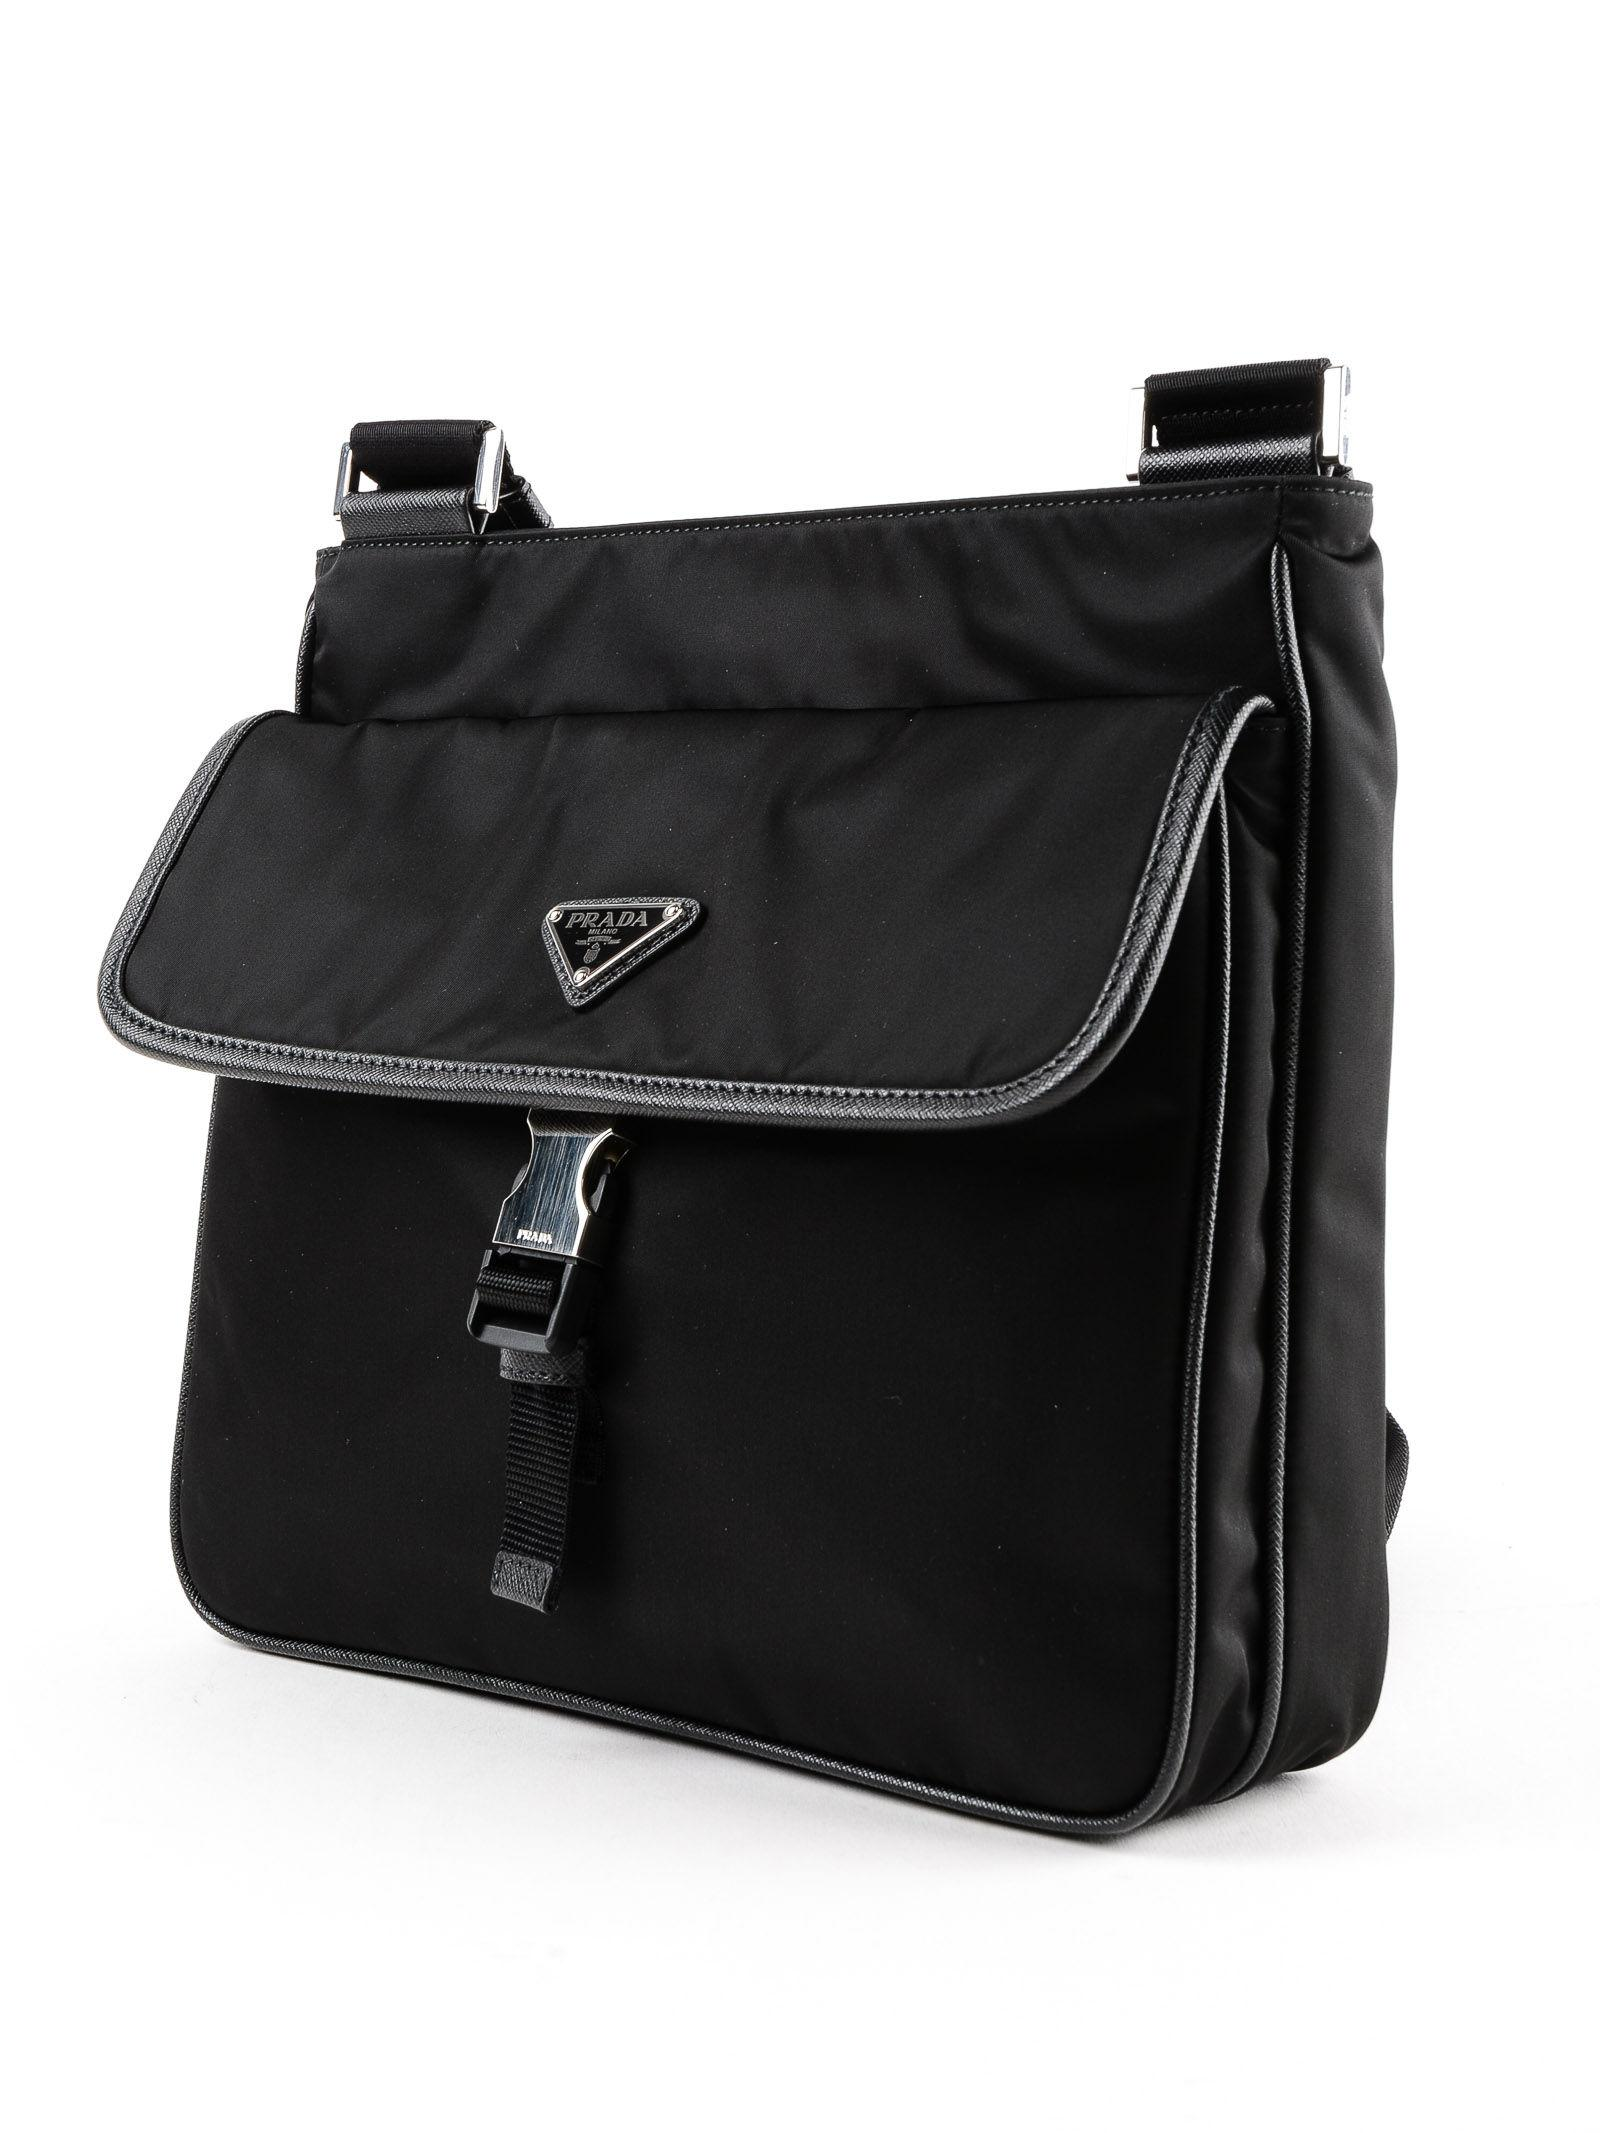 78c41a6f97c2 get lyst prada tessuto impunturato satchel bag in black 325a7 a57d6